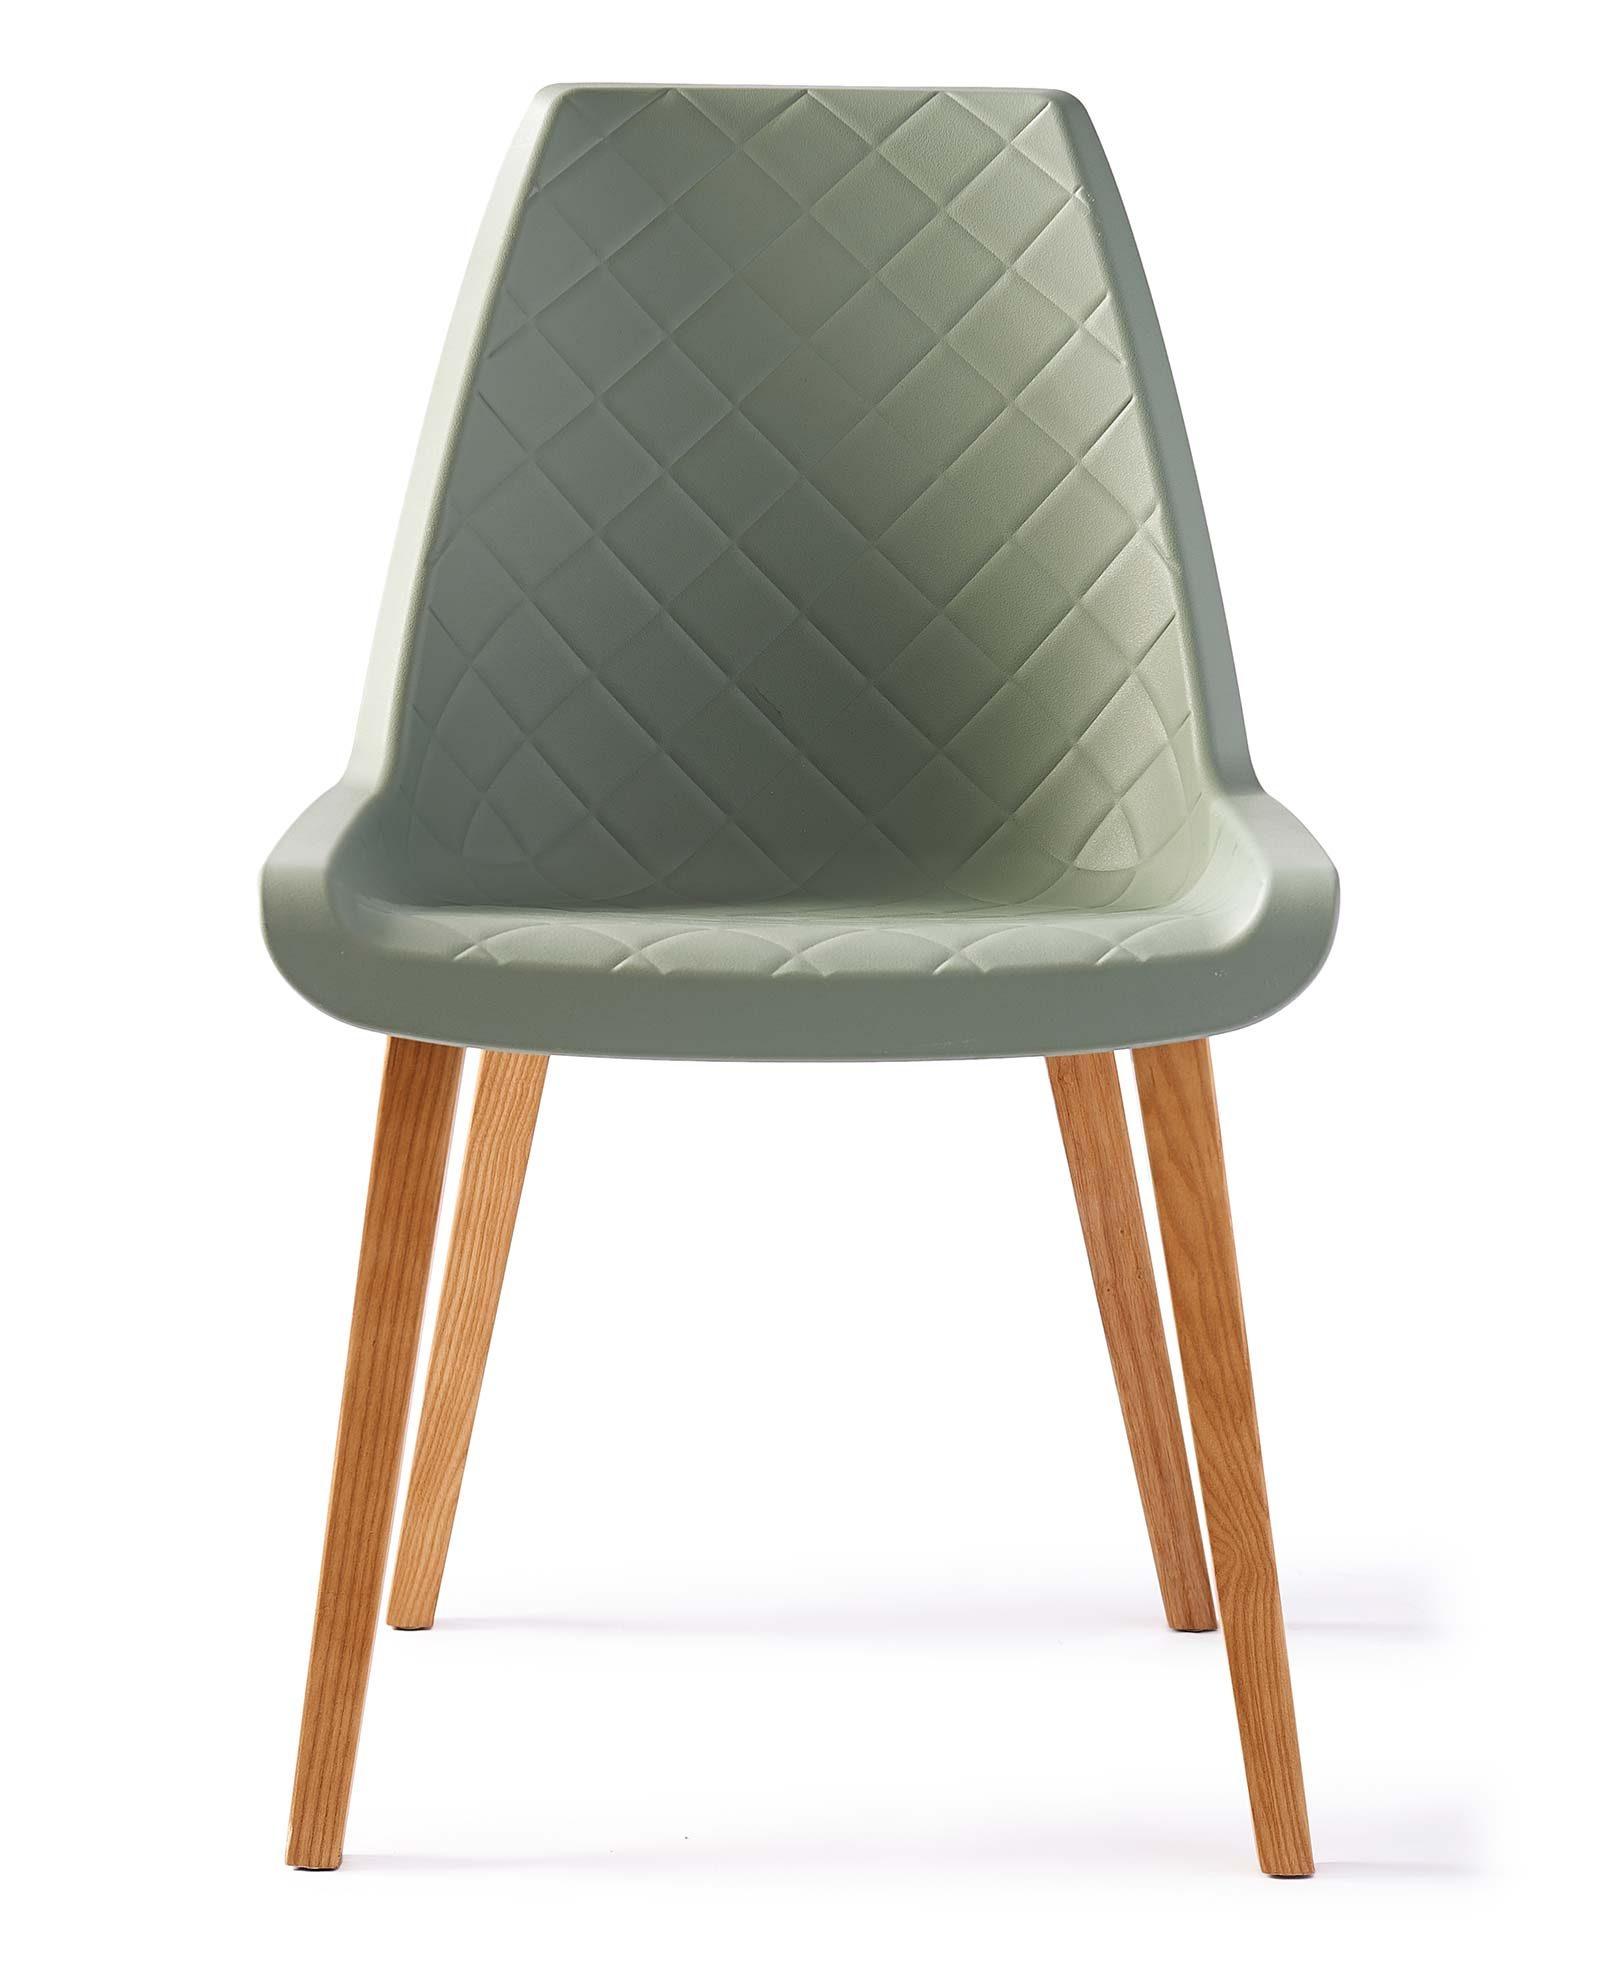 Riviera Maison chaise salle a manger Amsterdam City Green 4321003 2